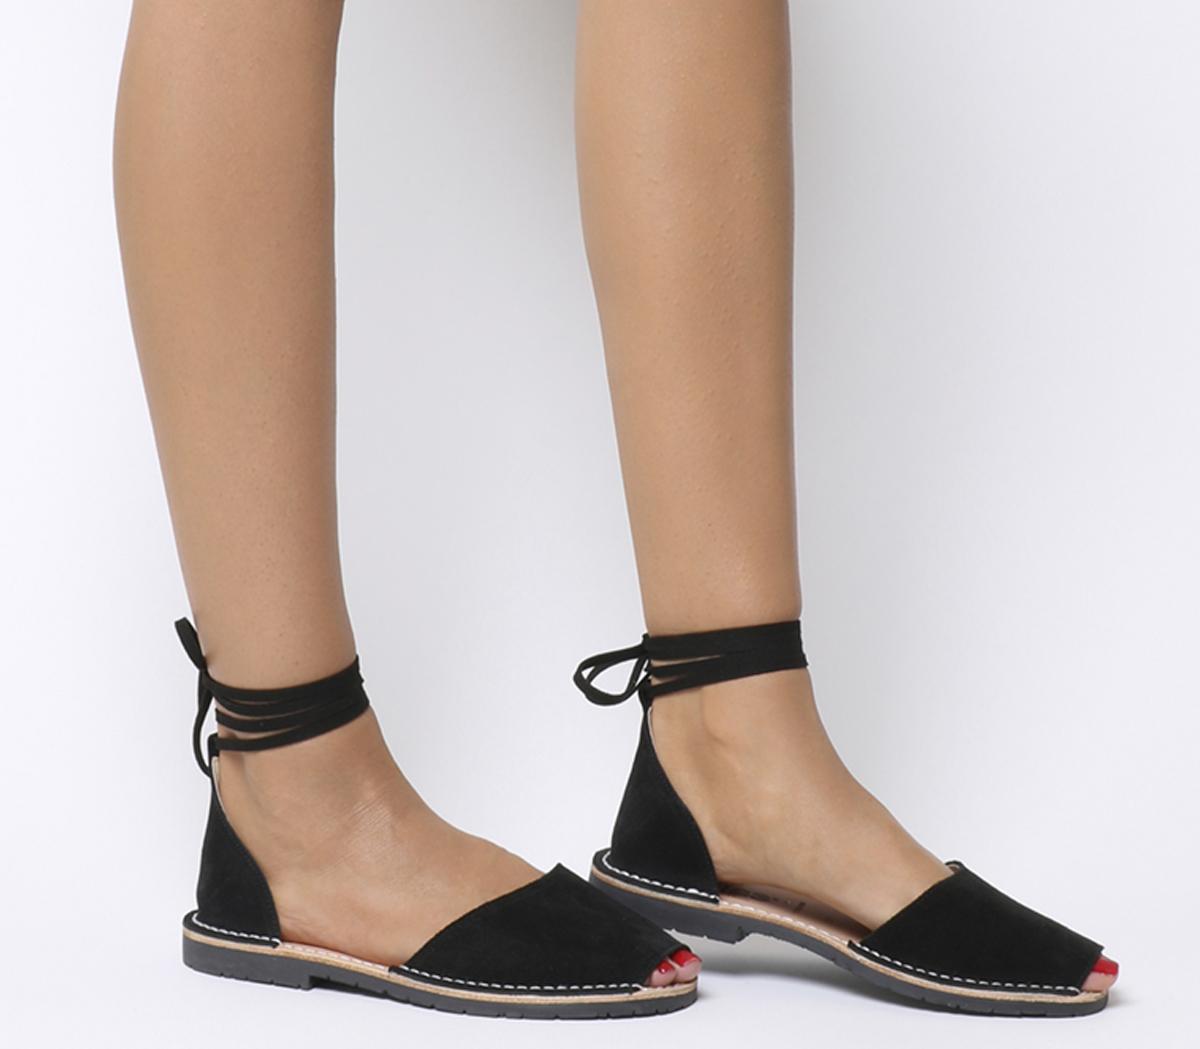 Solillas Ankle Tie Sandals Black Suede